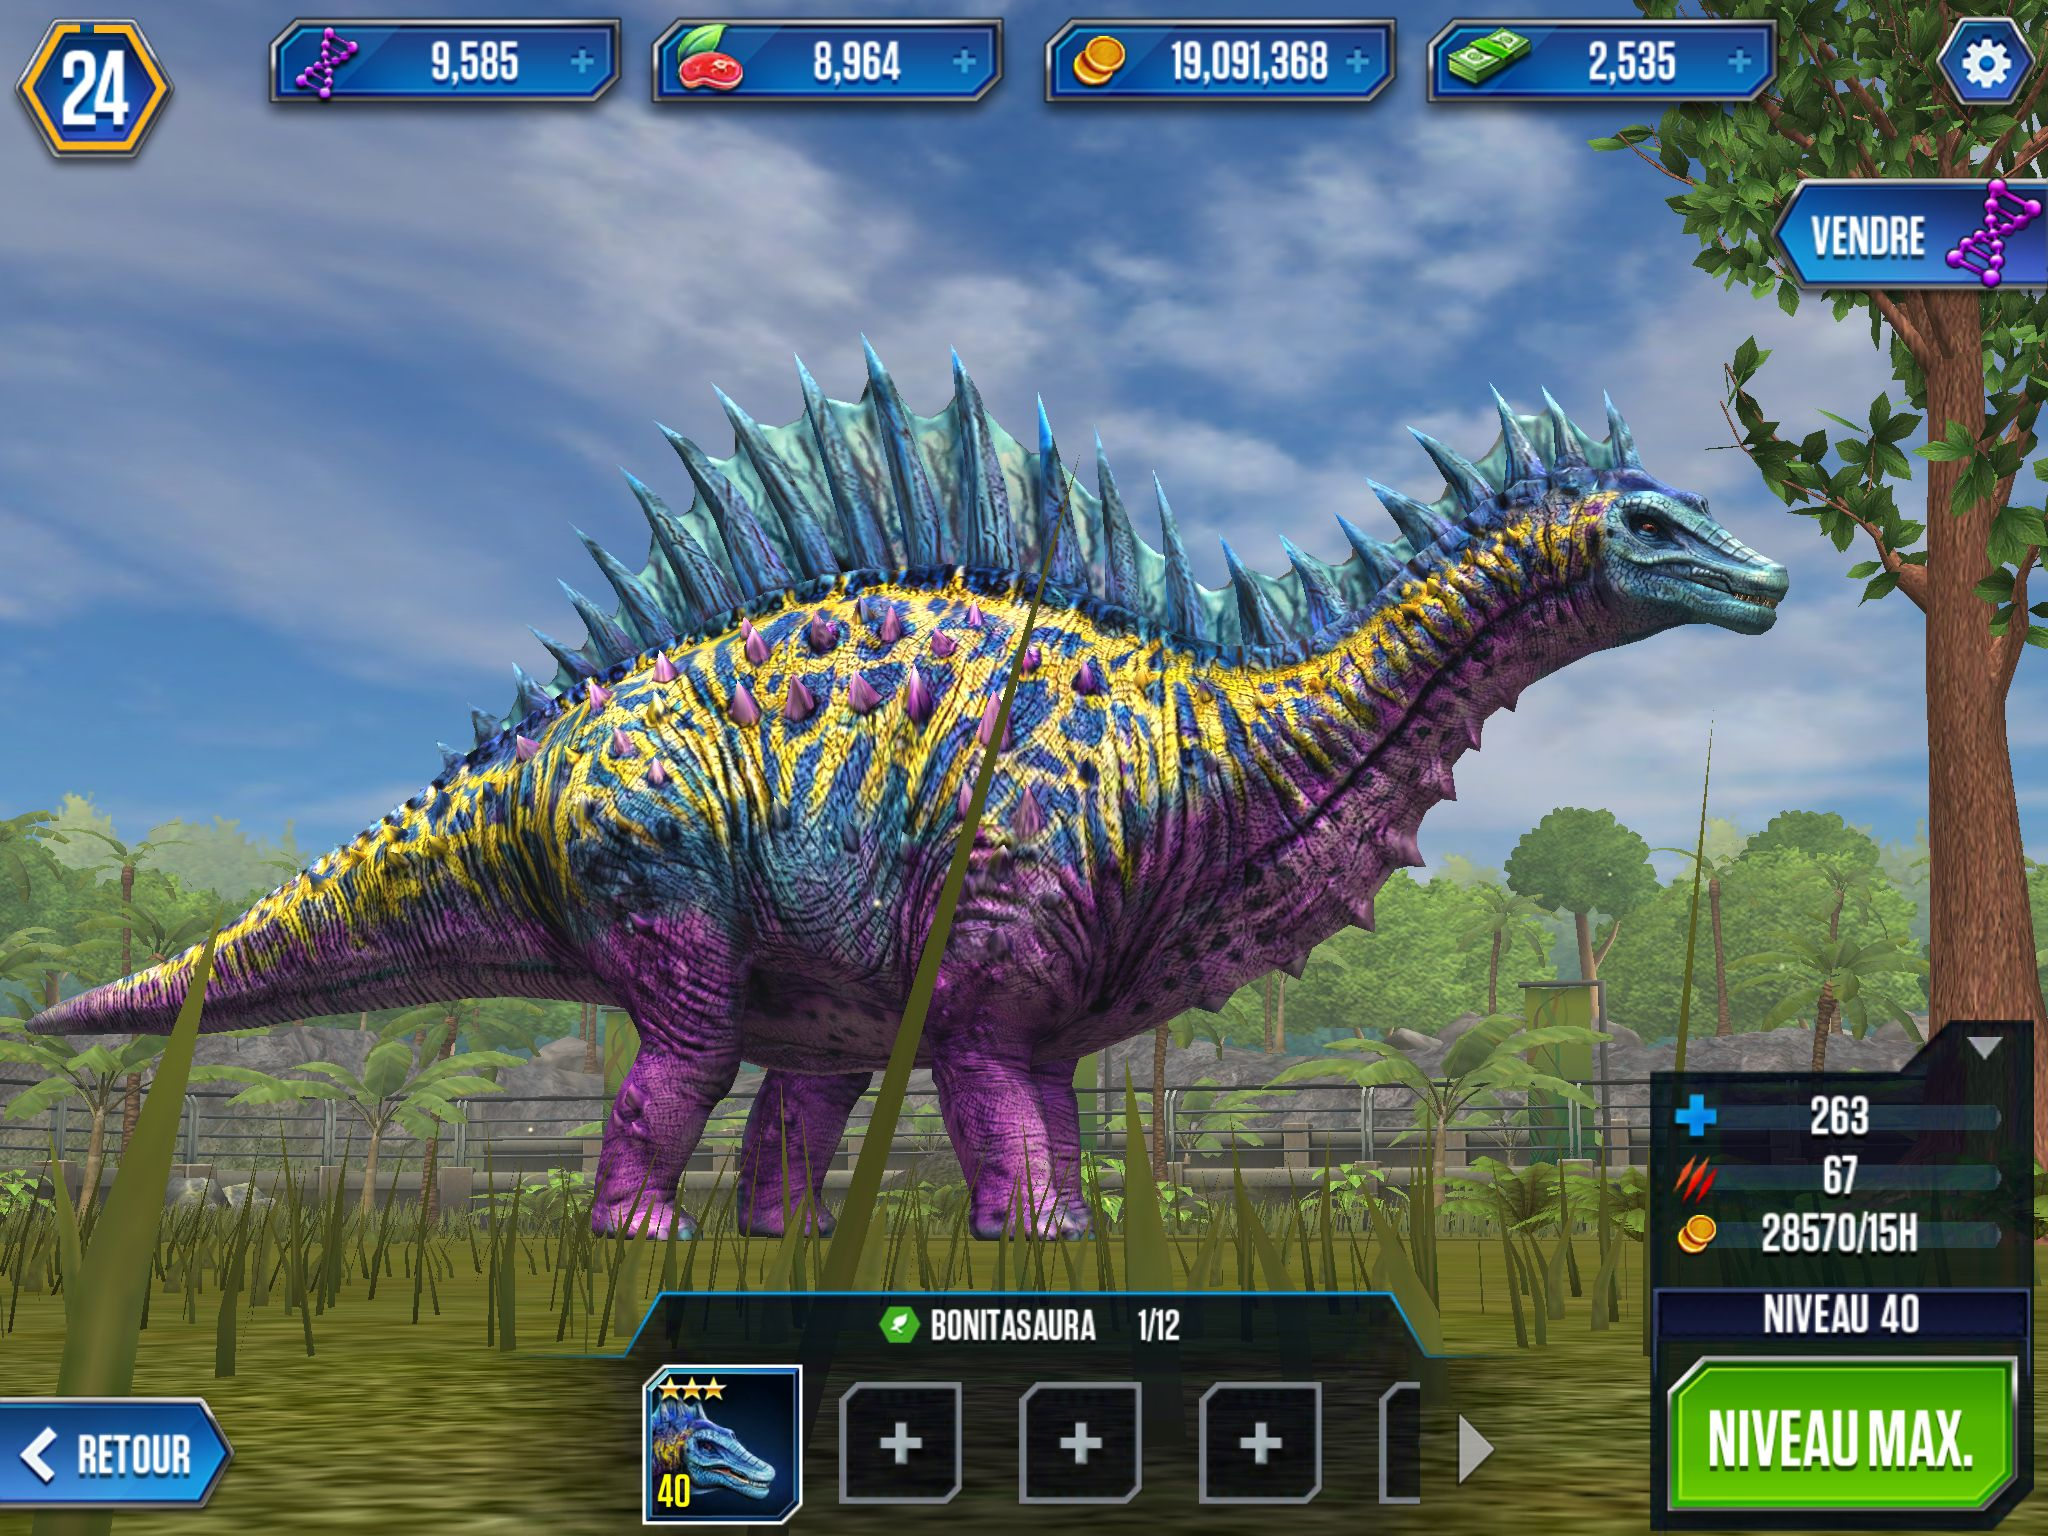 Bonitasaura jurassic world game dinosaure madilyn - Dinosaure jurassic world ...